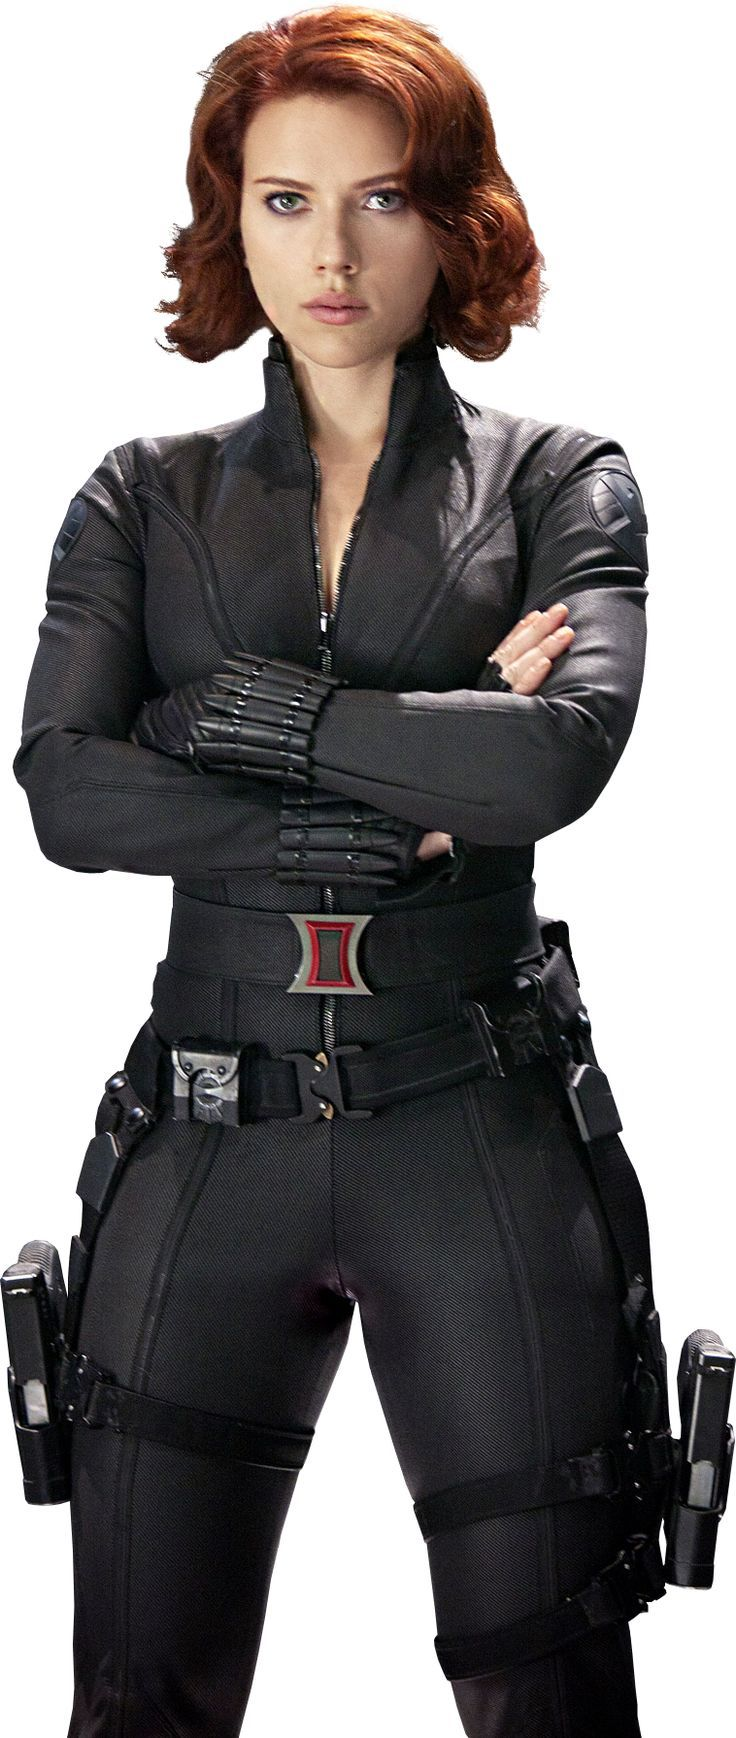 black widow costume diy - Google Search                                                                                                                                                                                 More